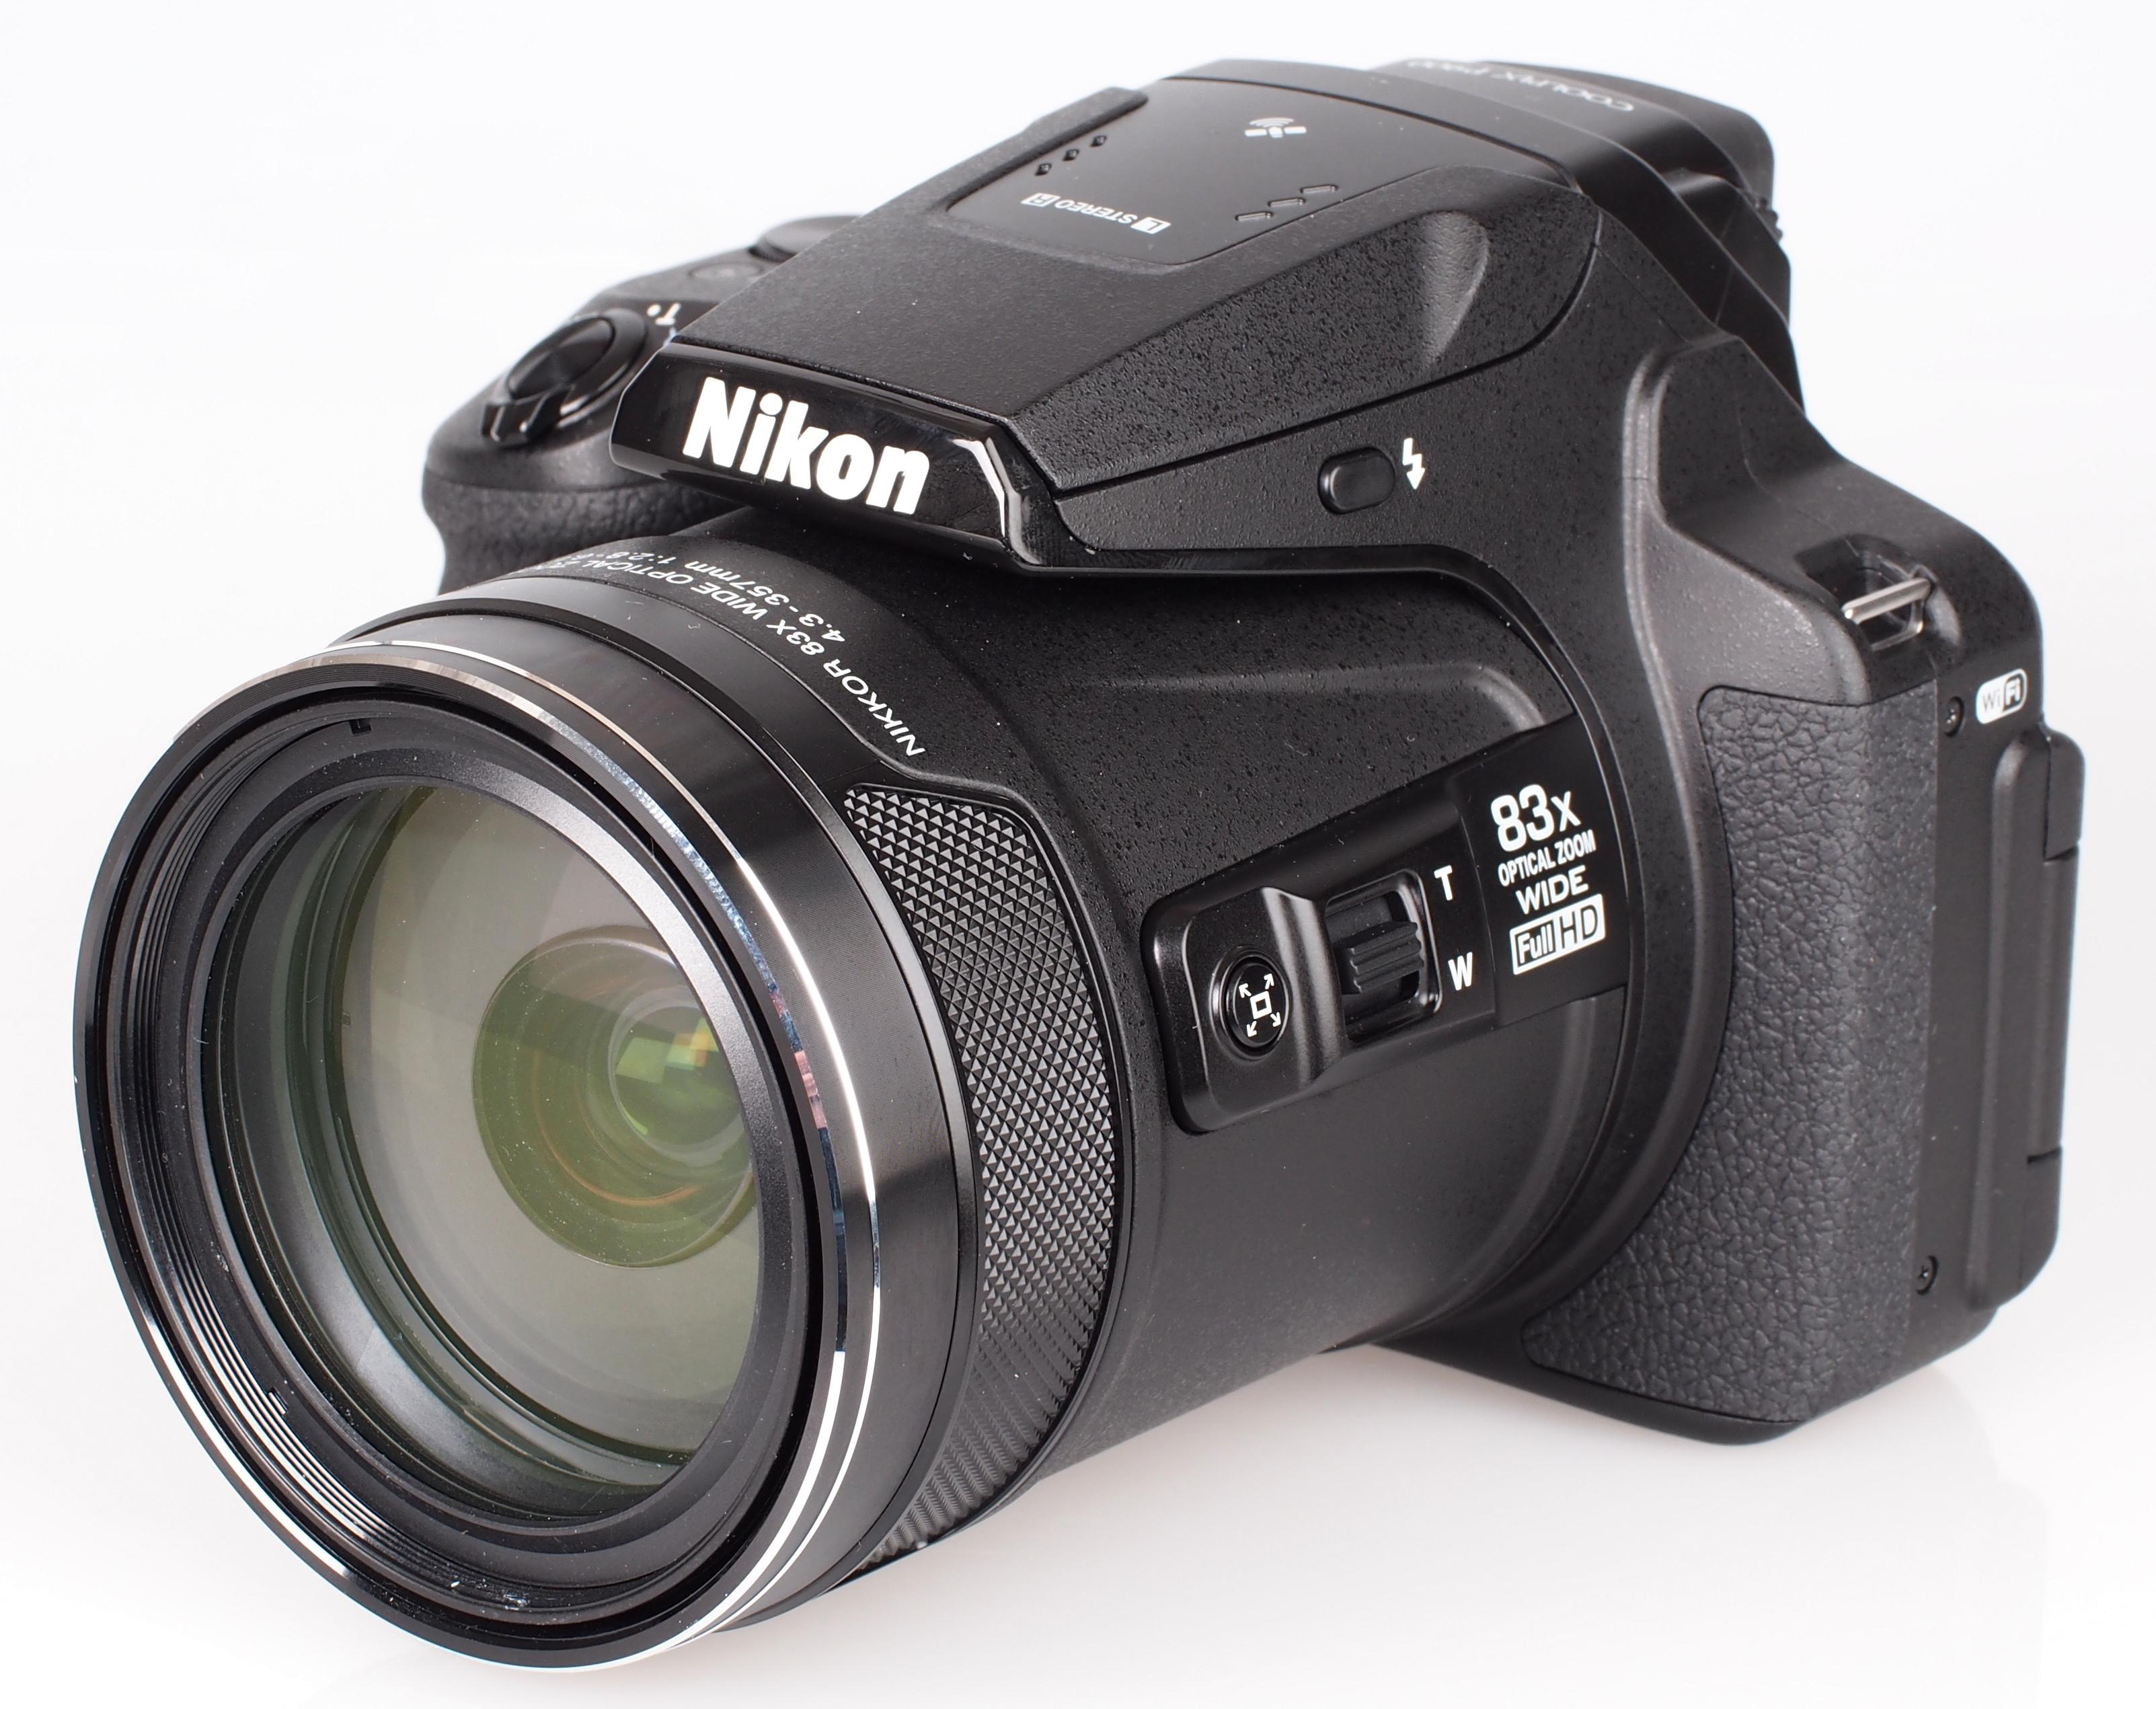 Win 1 4 Nikon COOLPIX P900 Cameras